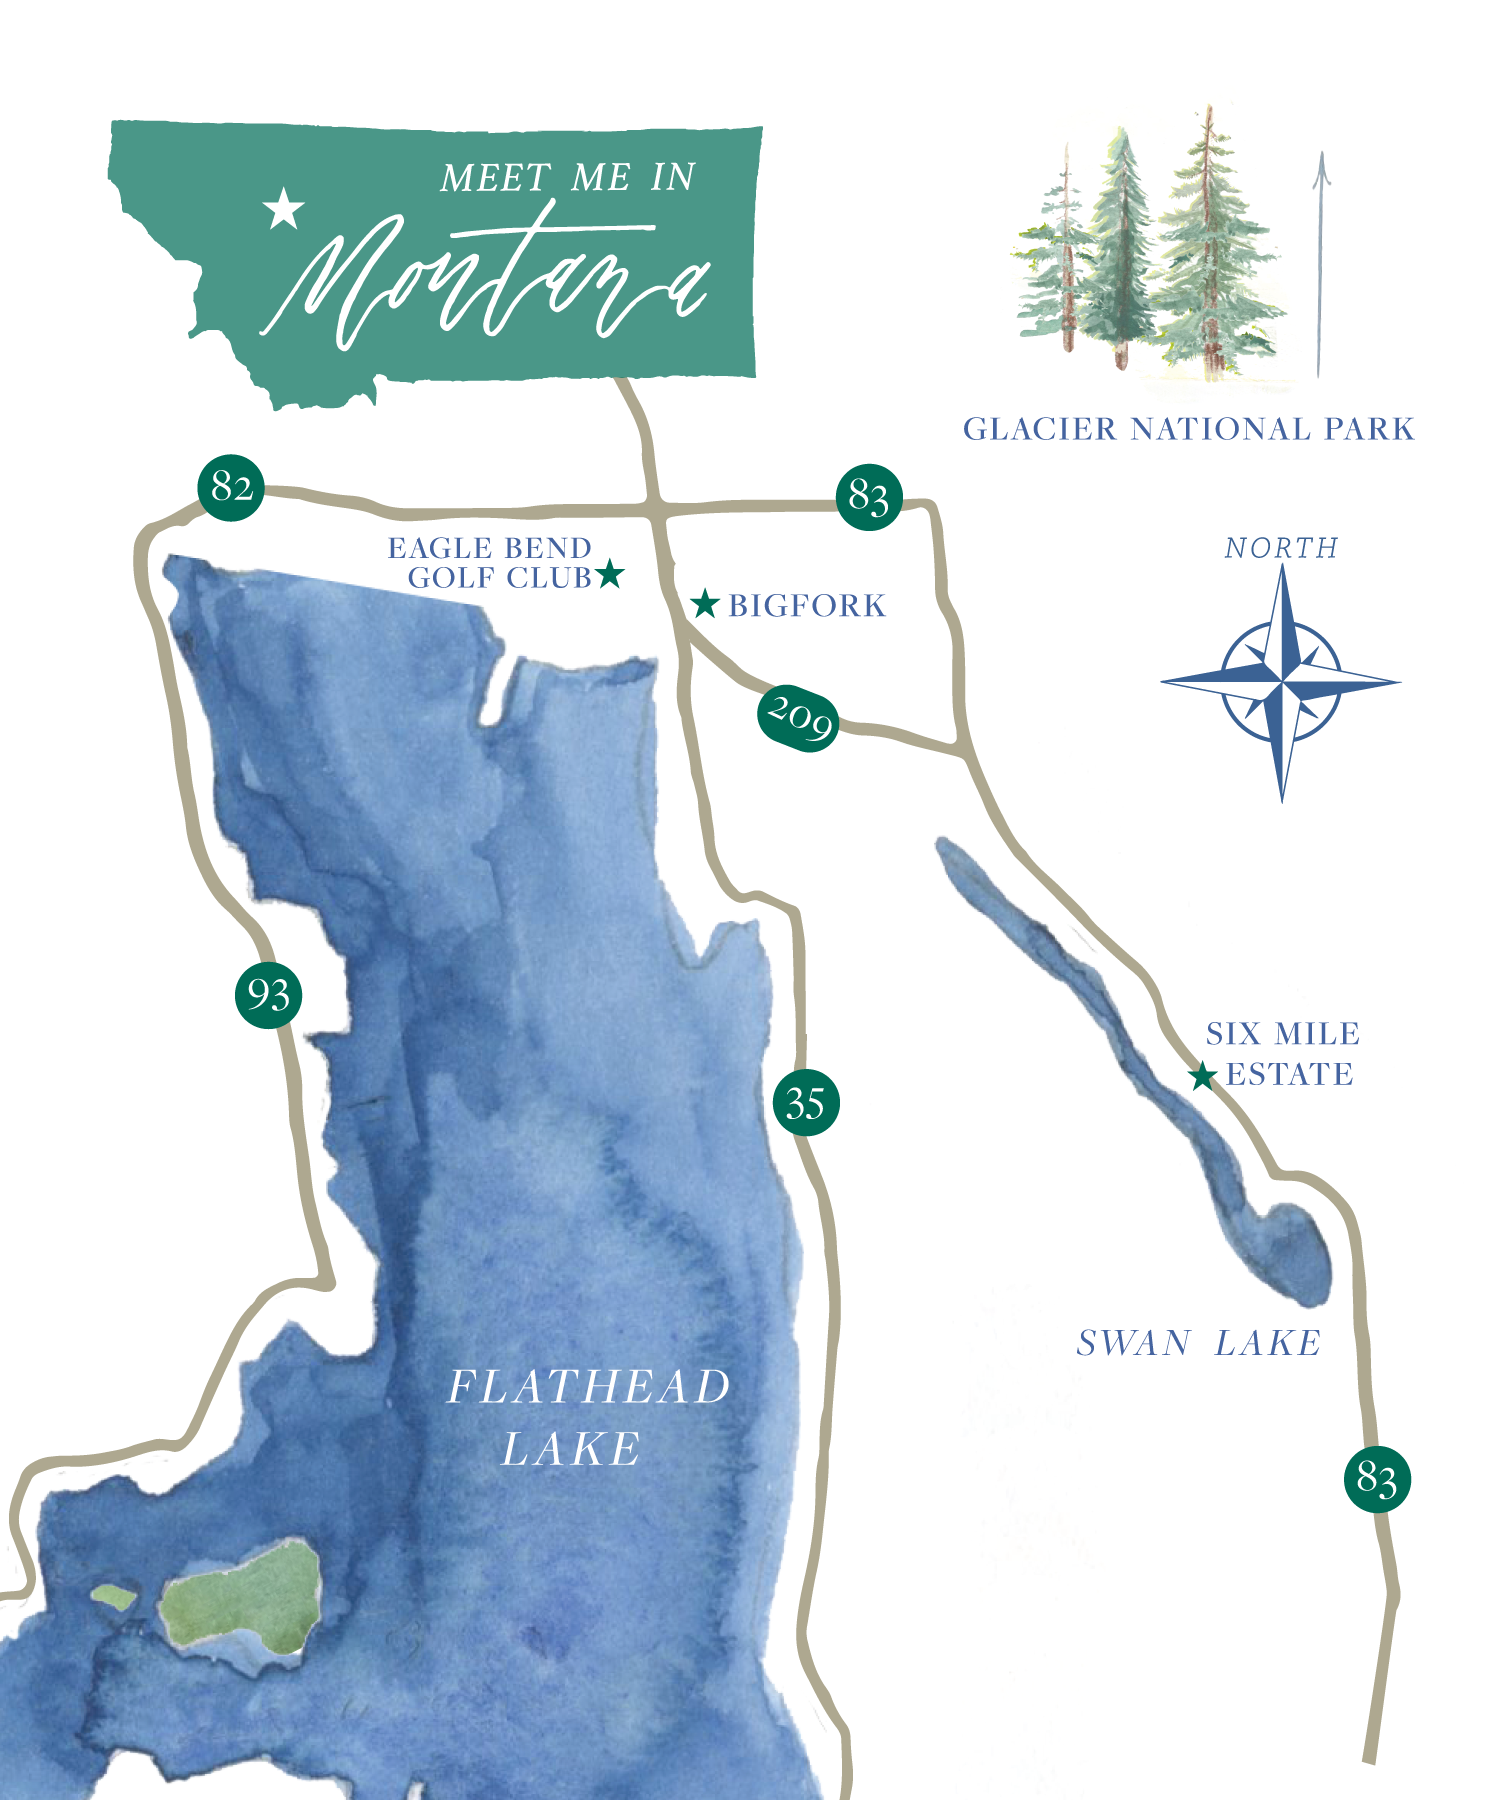 Watkins Pfinsgraff_Invitation_R2_Map (Illustration).png